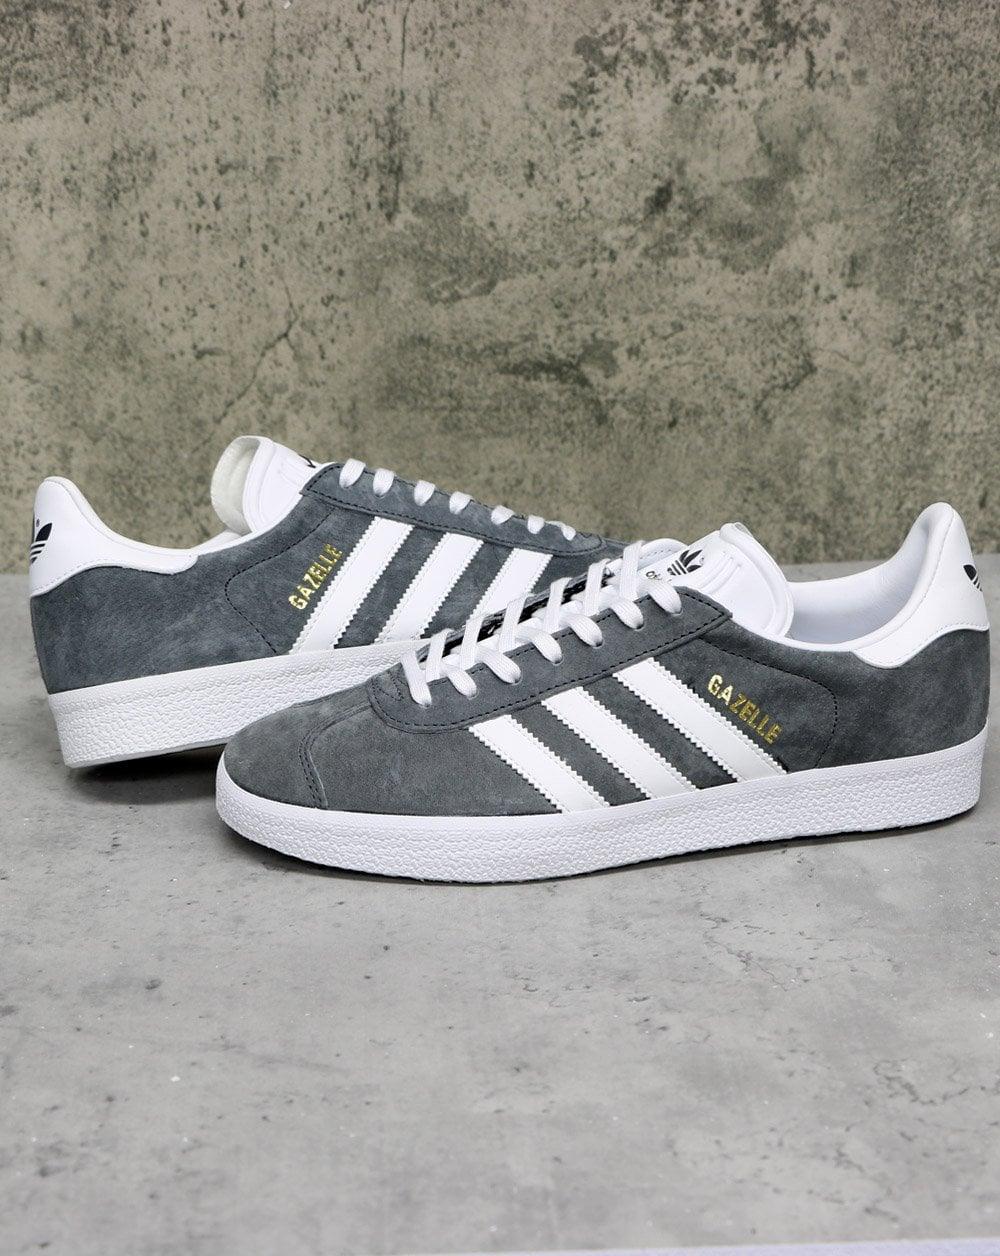 Adidas Gazelle Trainers Dk Grey/White